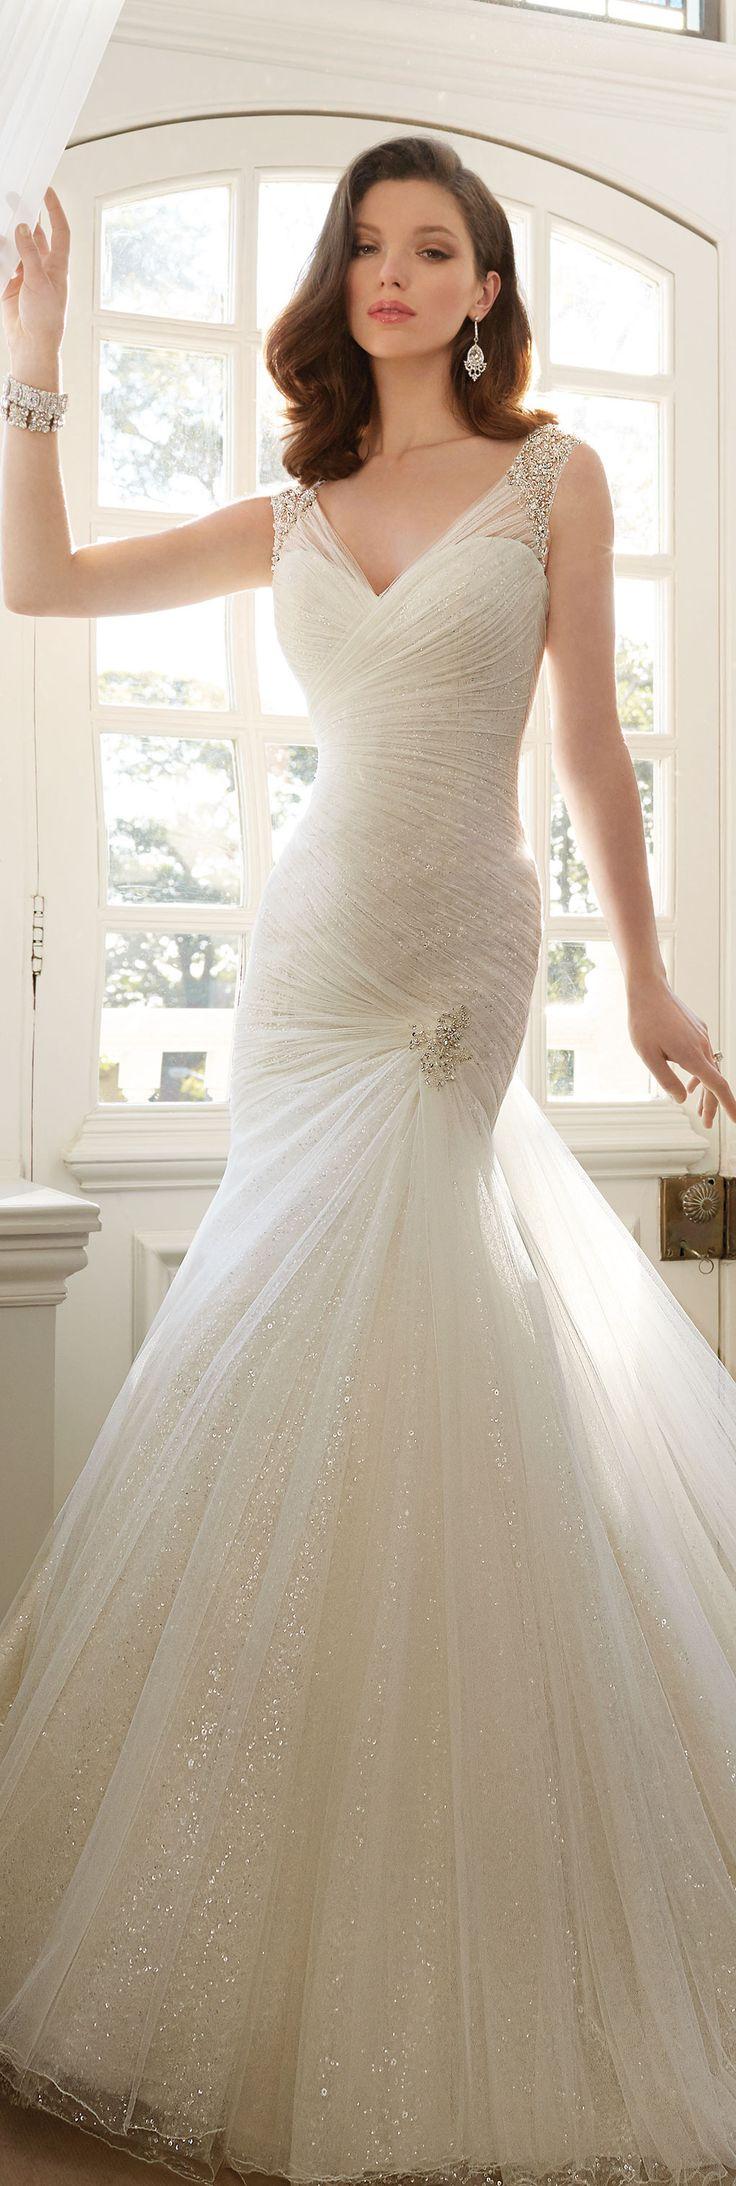 25 best ideas about wedding dress styles on pinterest dress necklines uk wedding gowns and nigerian dresses designs